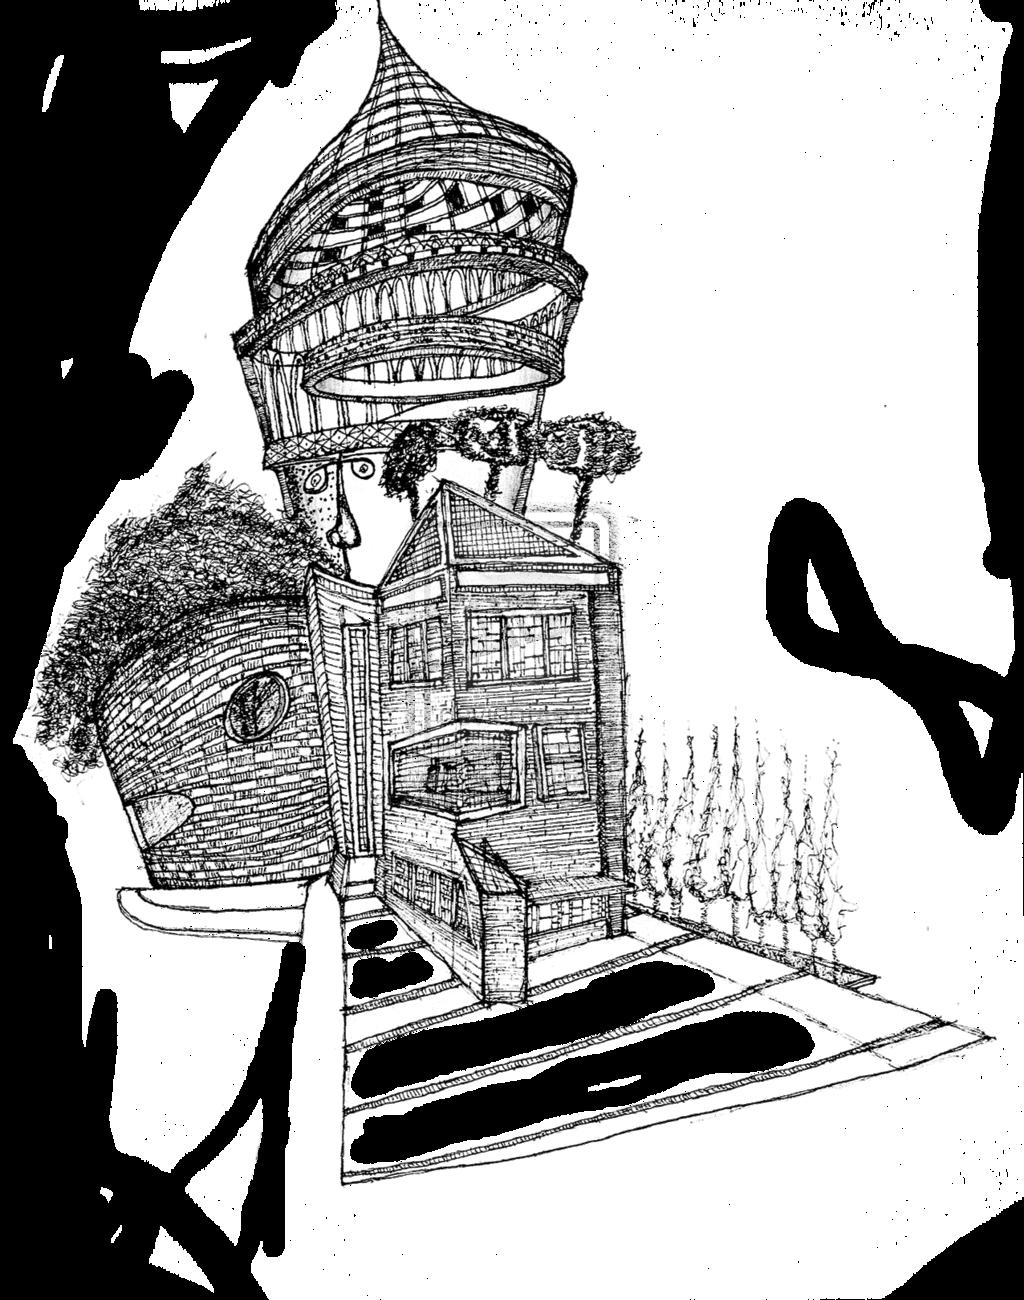 Surrel Tower by xxxfashonxxx.deviantart.com on @deviantART